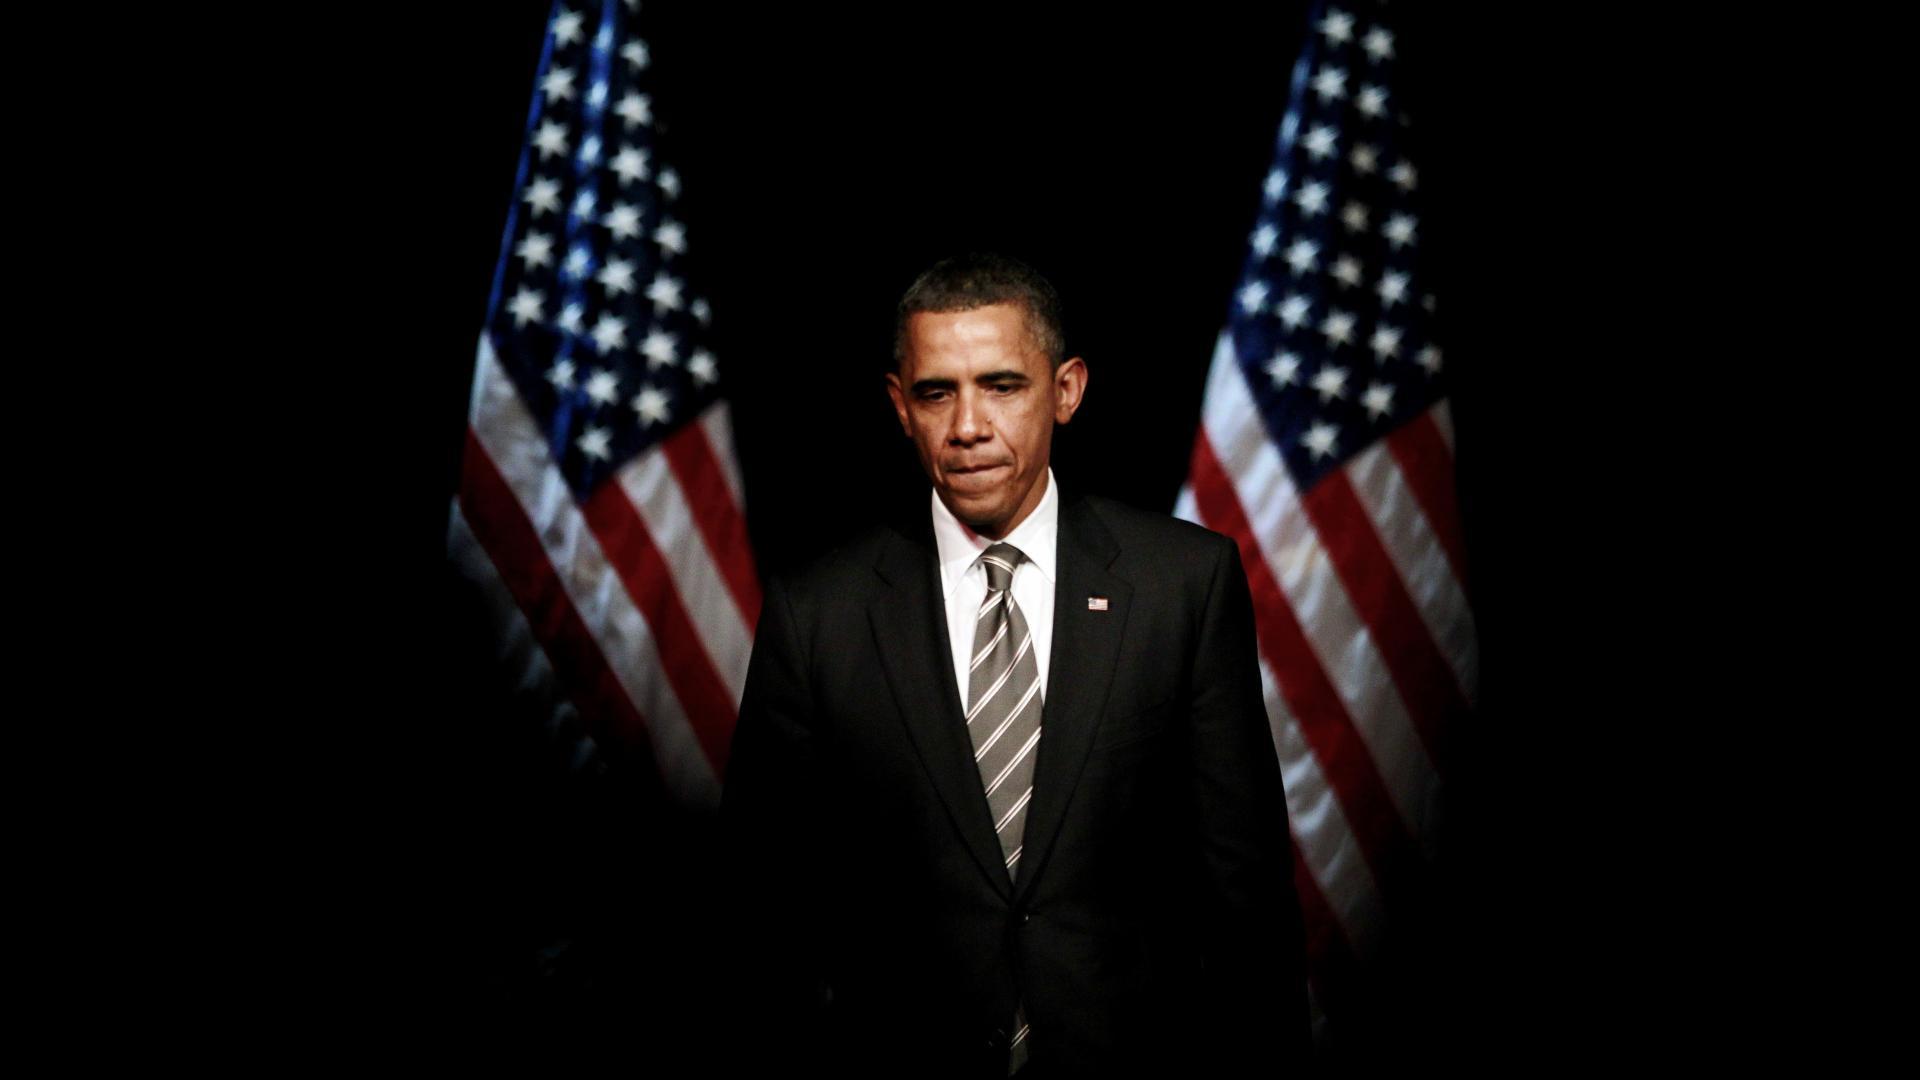 Wallpapers Barack Obama 1920x1080